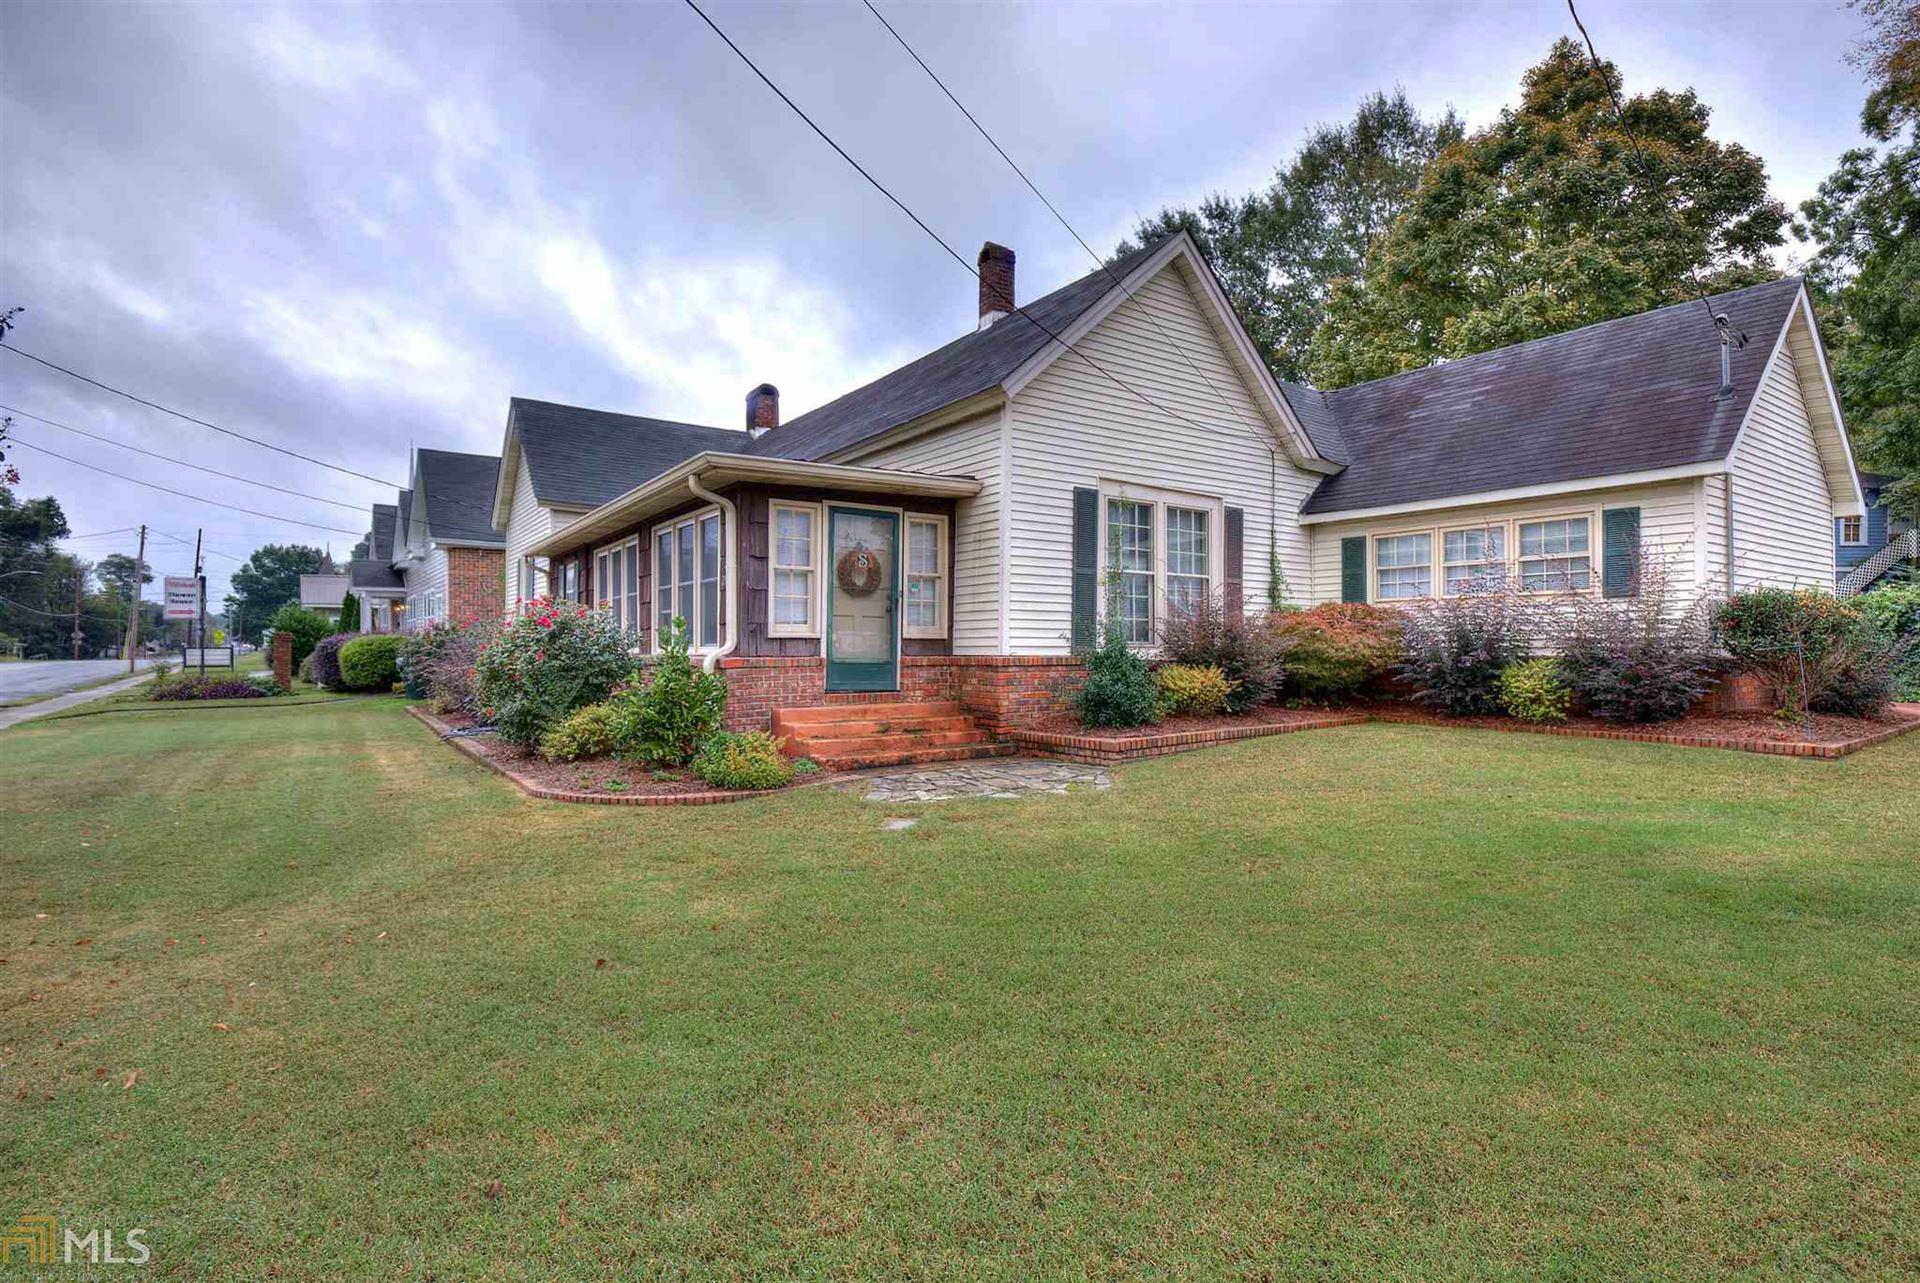 201 Elm, Rockmart, GA 30153 - MLS#: 8875275